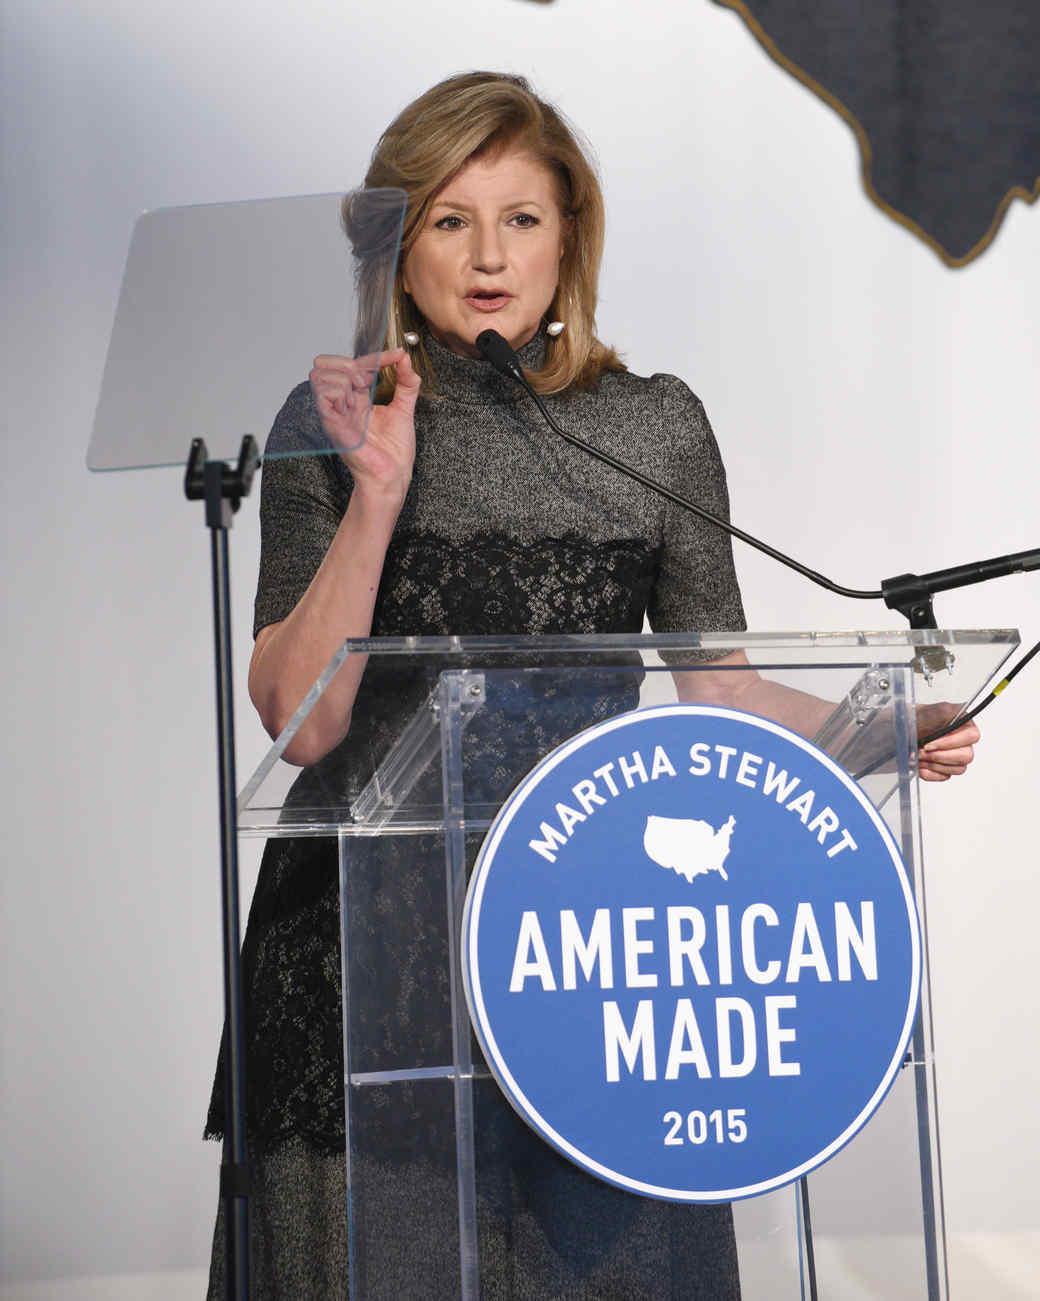 american-made-2015-event-huffington.jpg